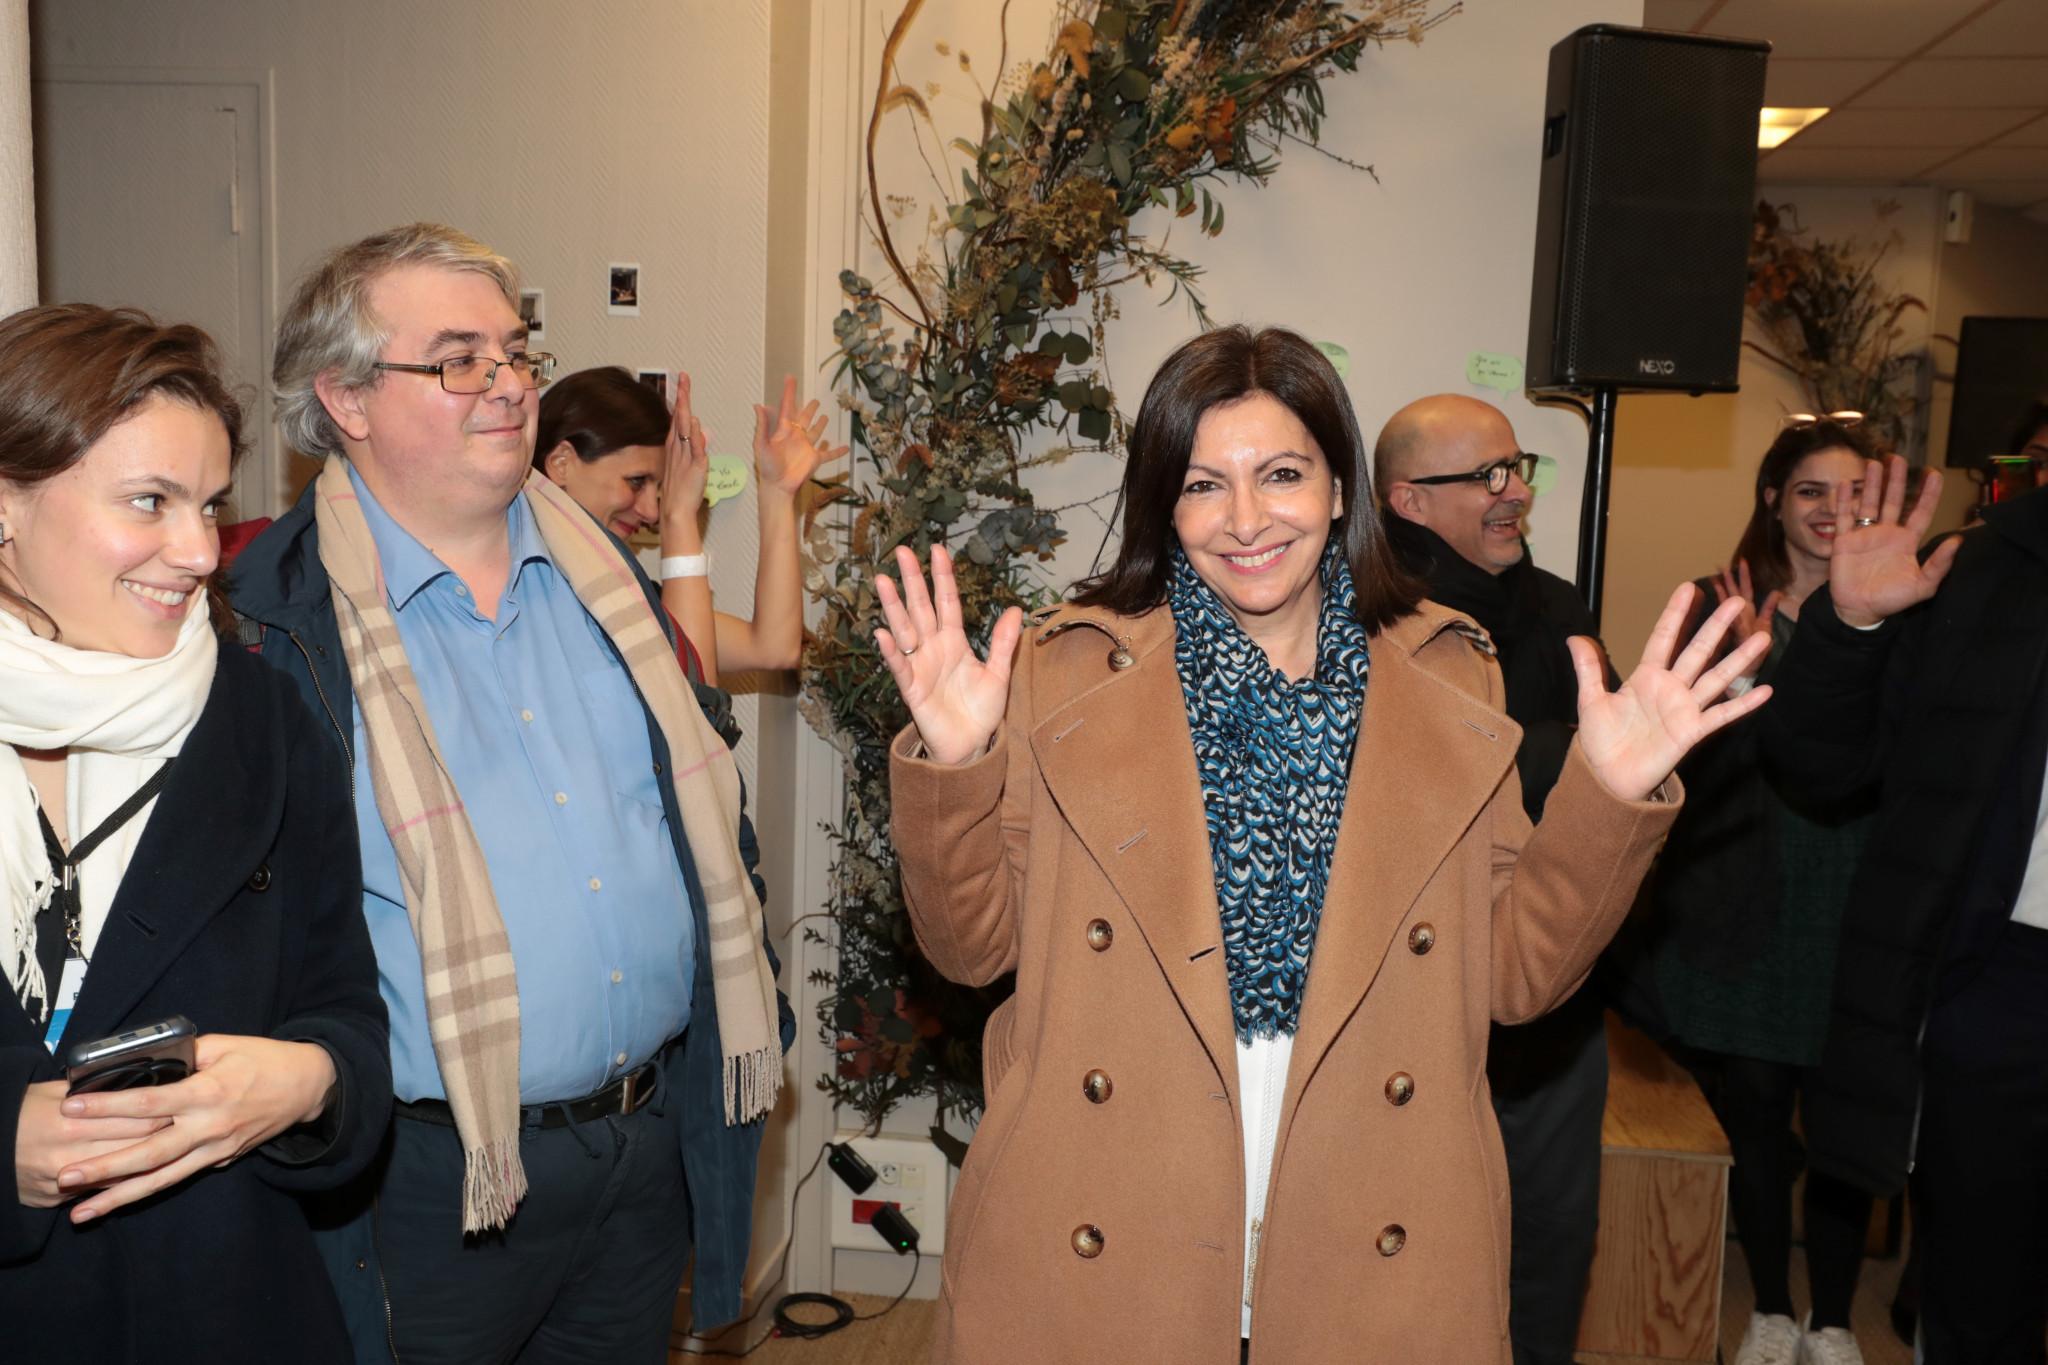 Incumbent Paris Mayor Anne Hidalgo had een ahead after the first round of voting